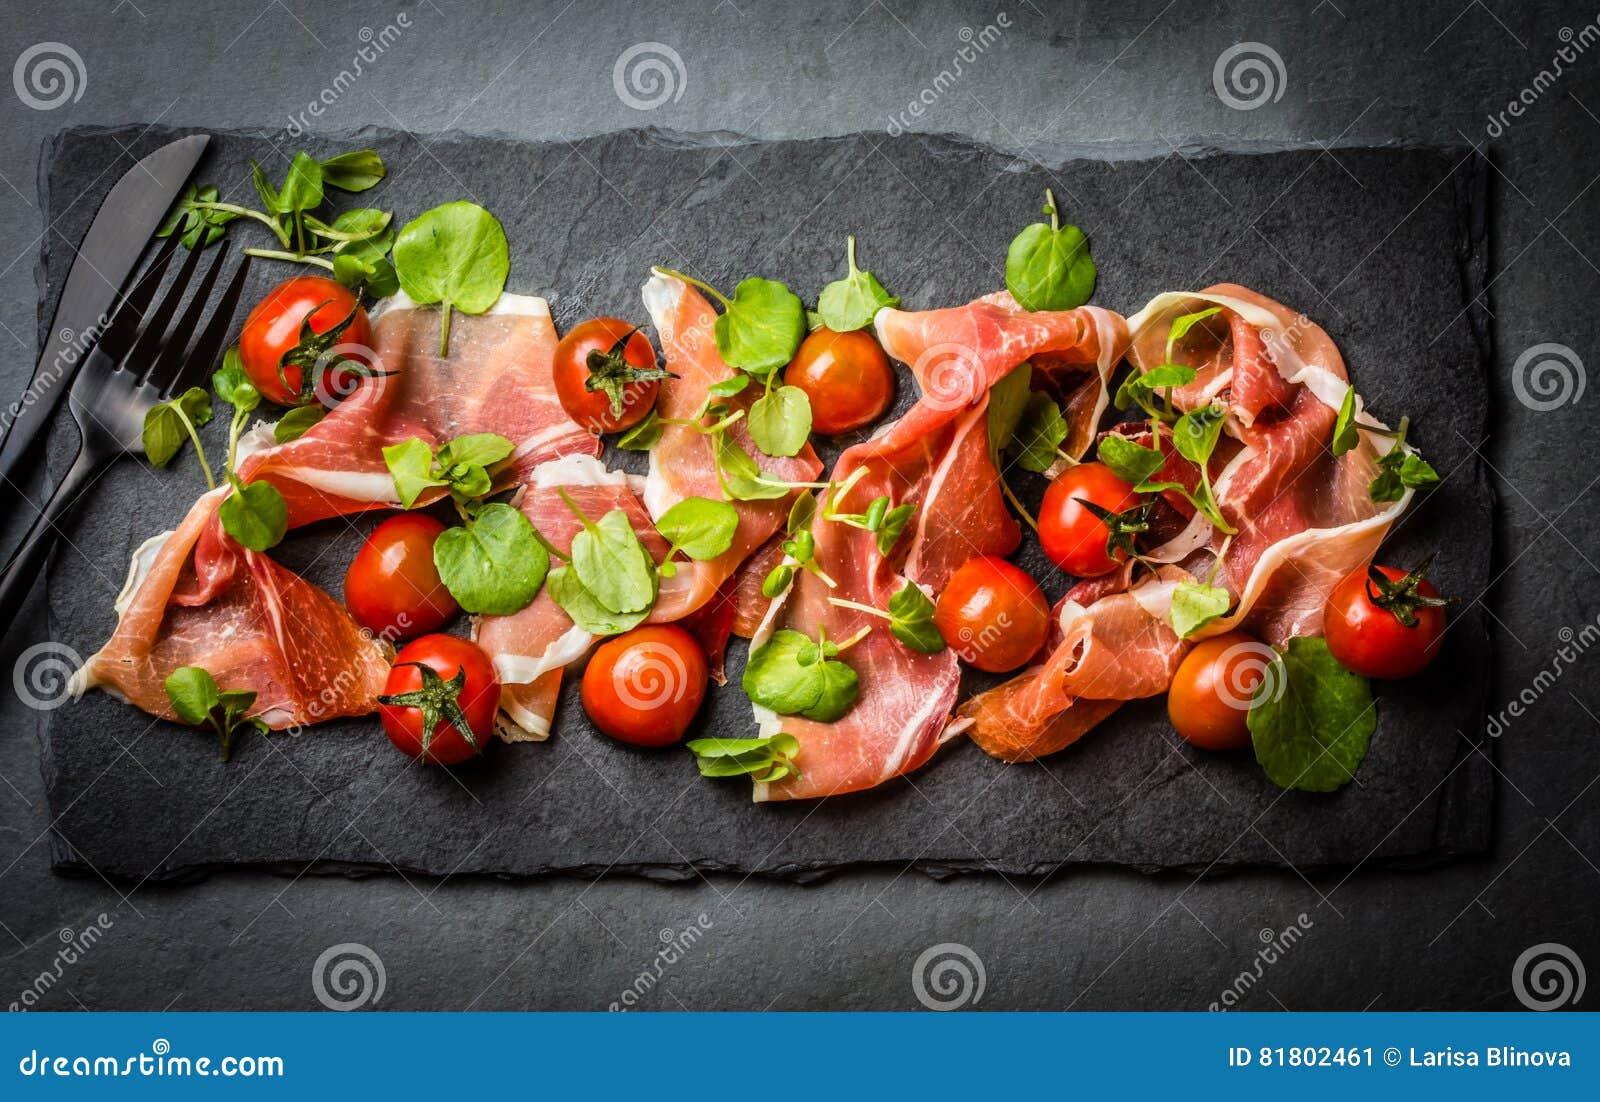 Салат с serrano jamon ветчины, томатами вишни, arugula, доской шифера